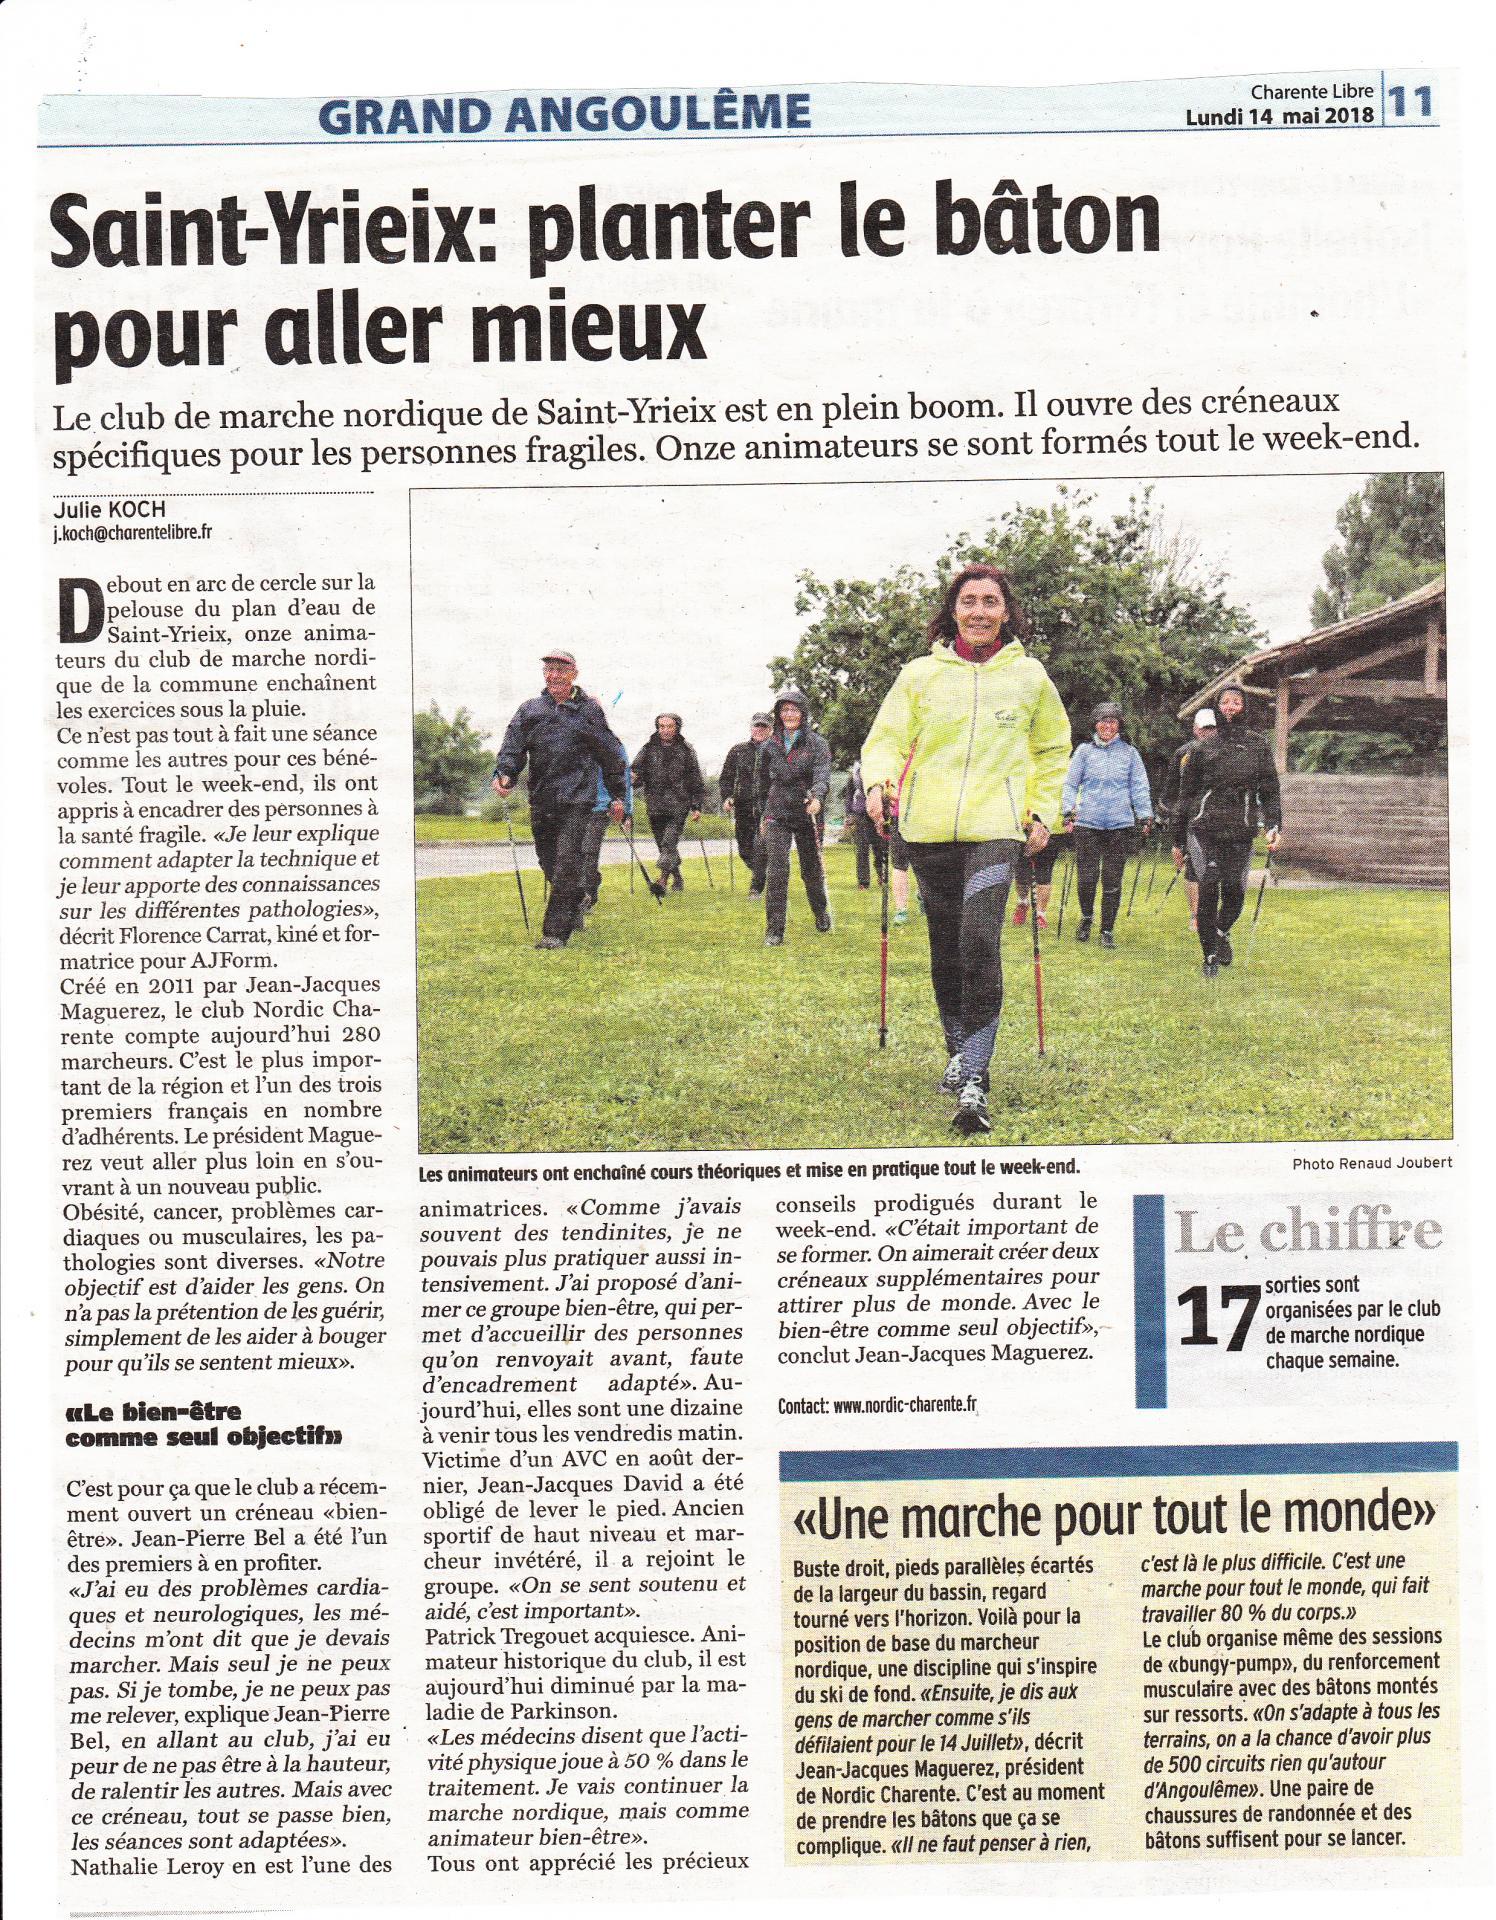 Charente libre 180514